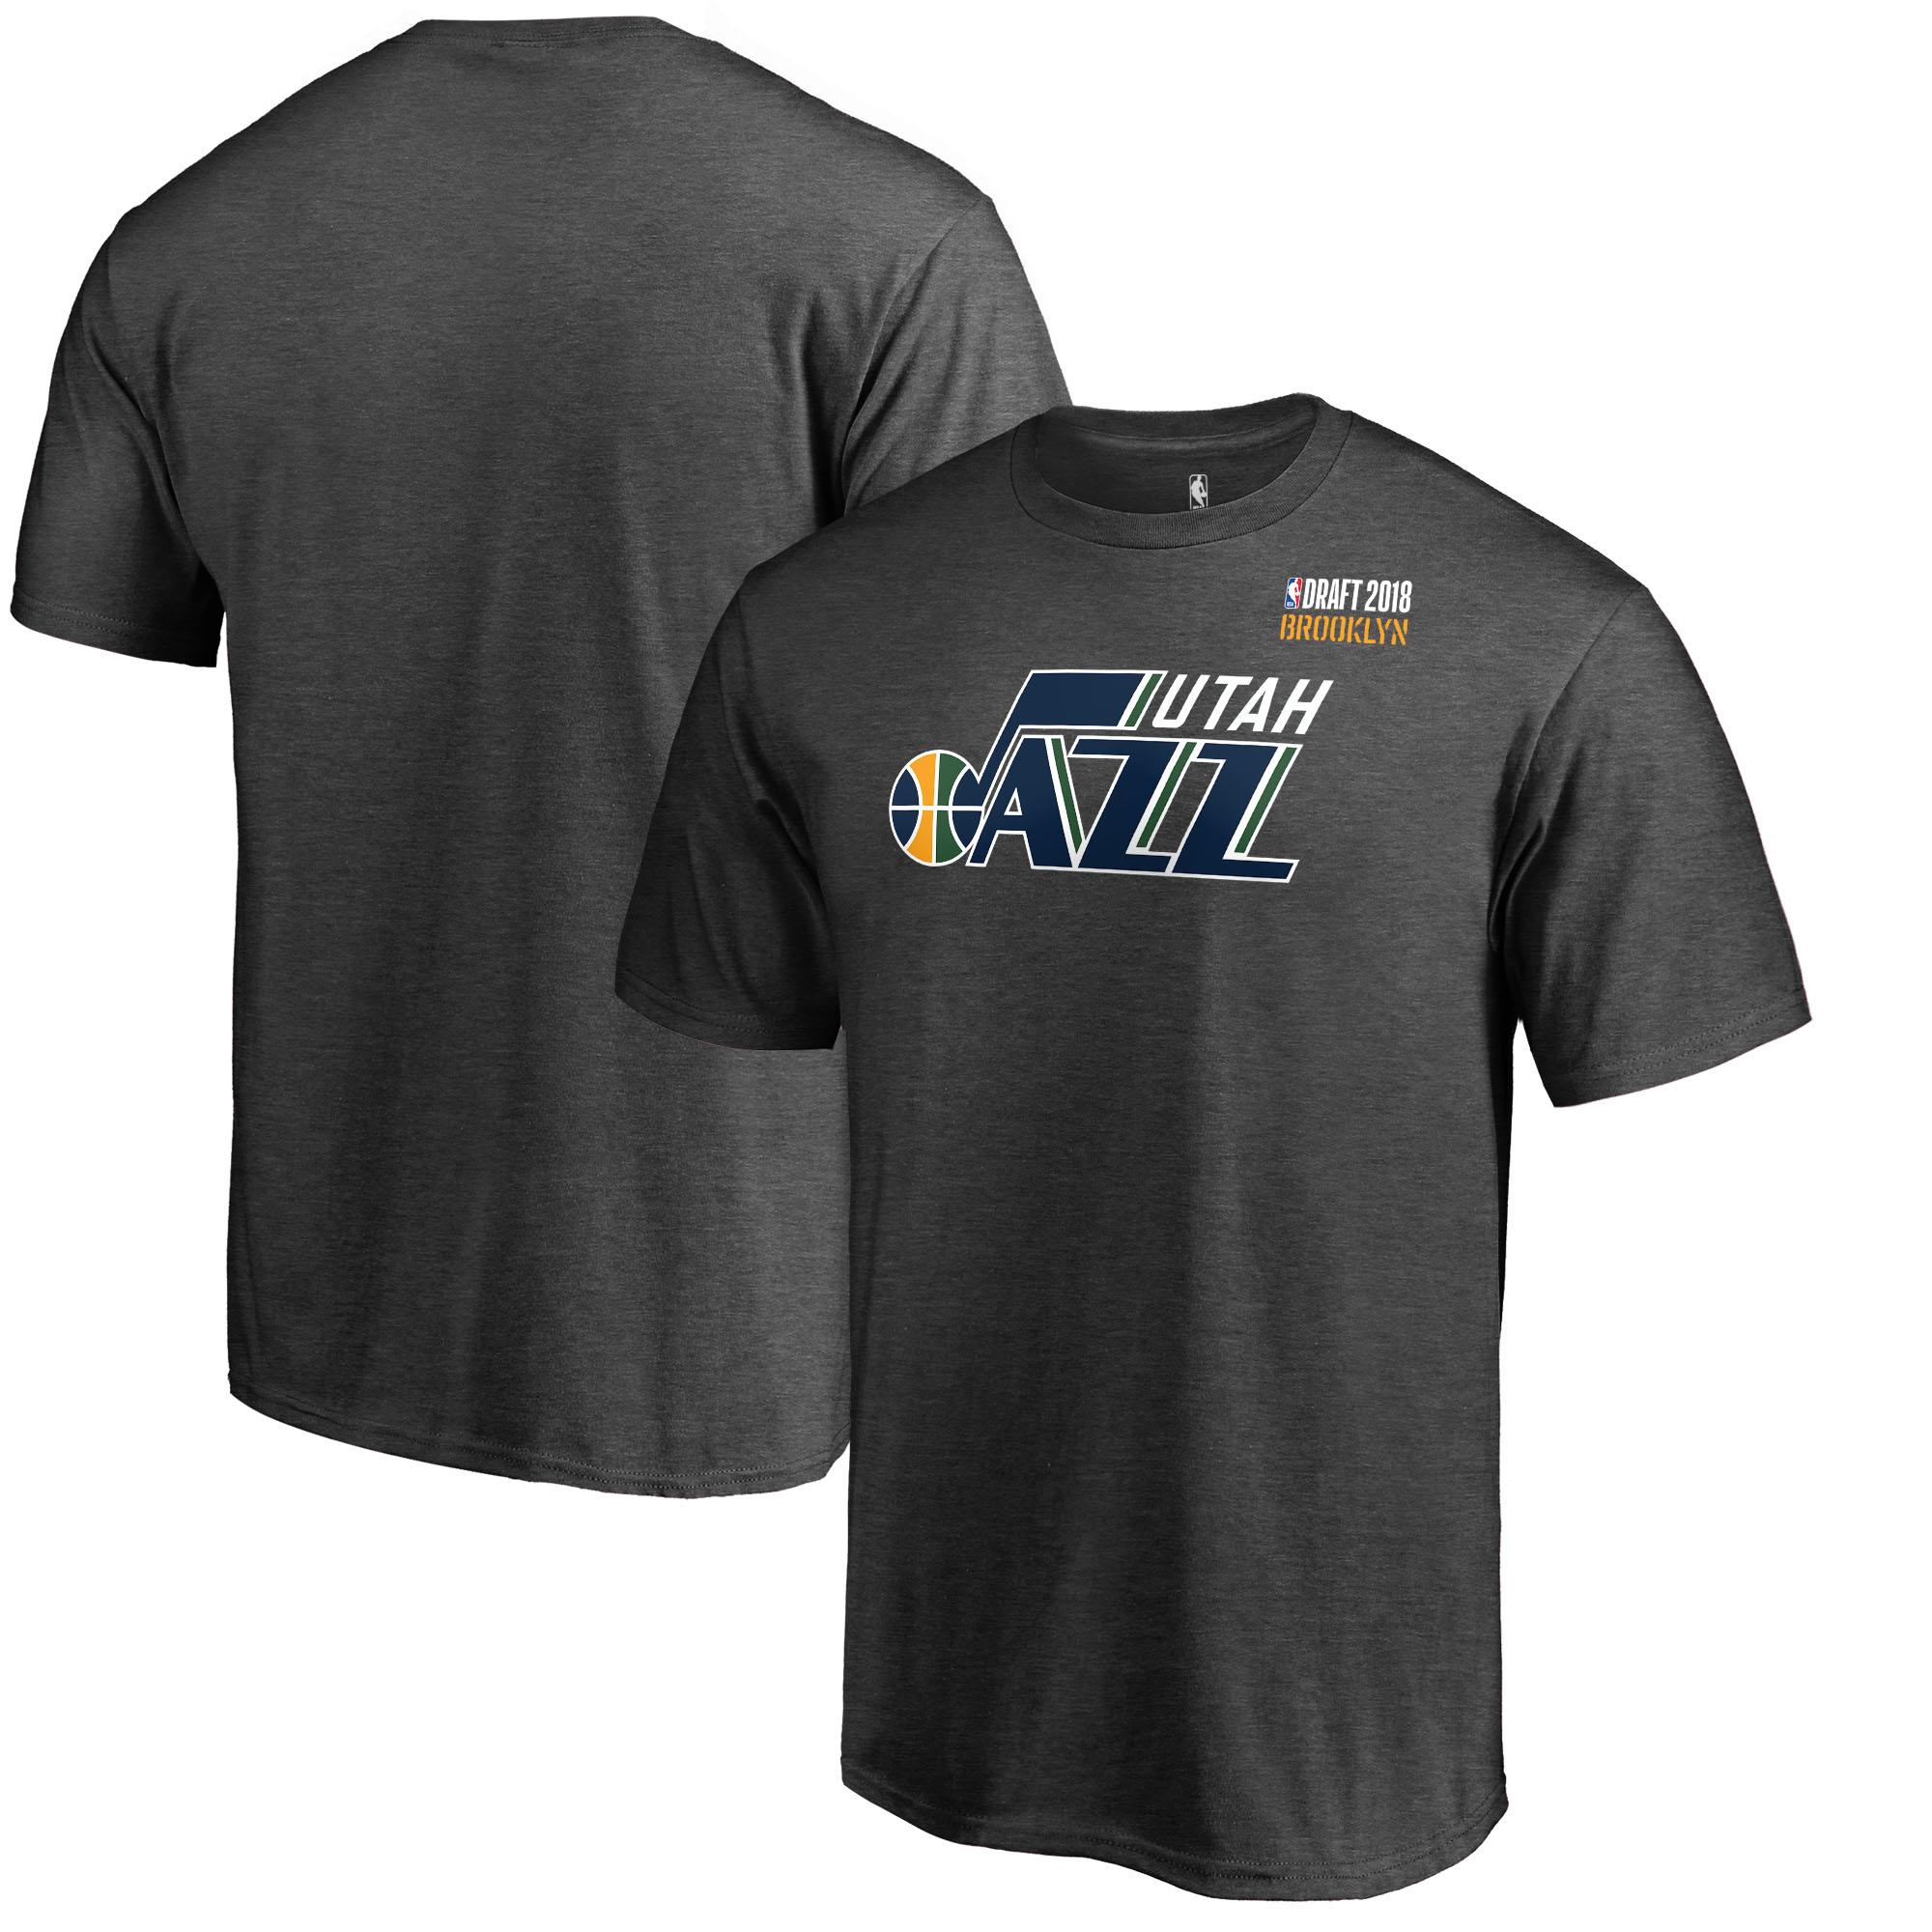 Utah Jazz Fanatics Branded 2018 NBA Draft BKLYN T-Shirt - Heather Gray